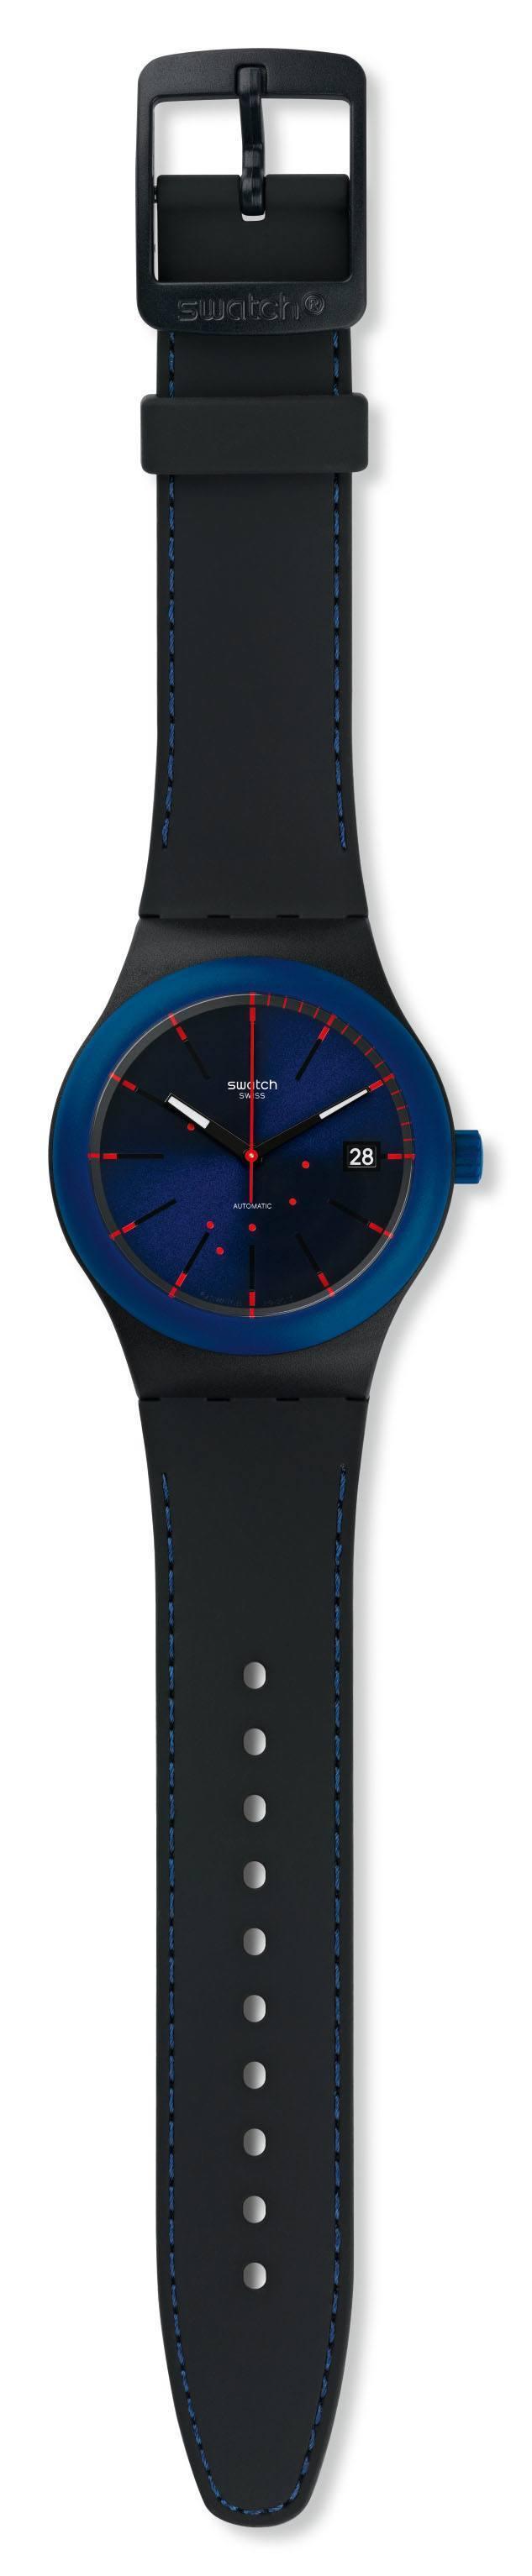 Swatch: Sistem51 Notte